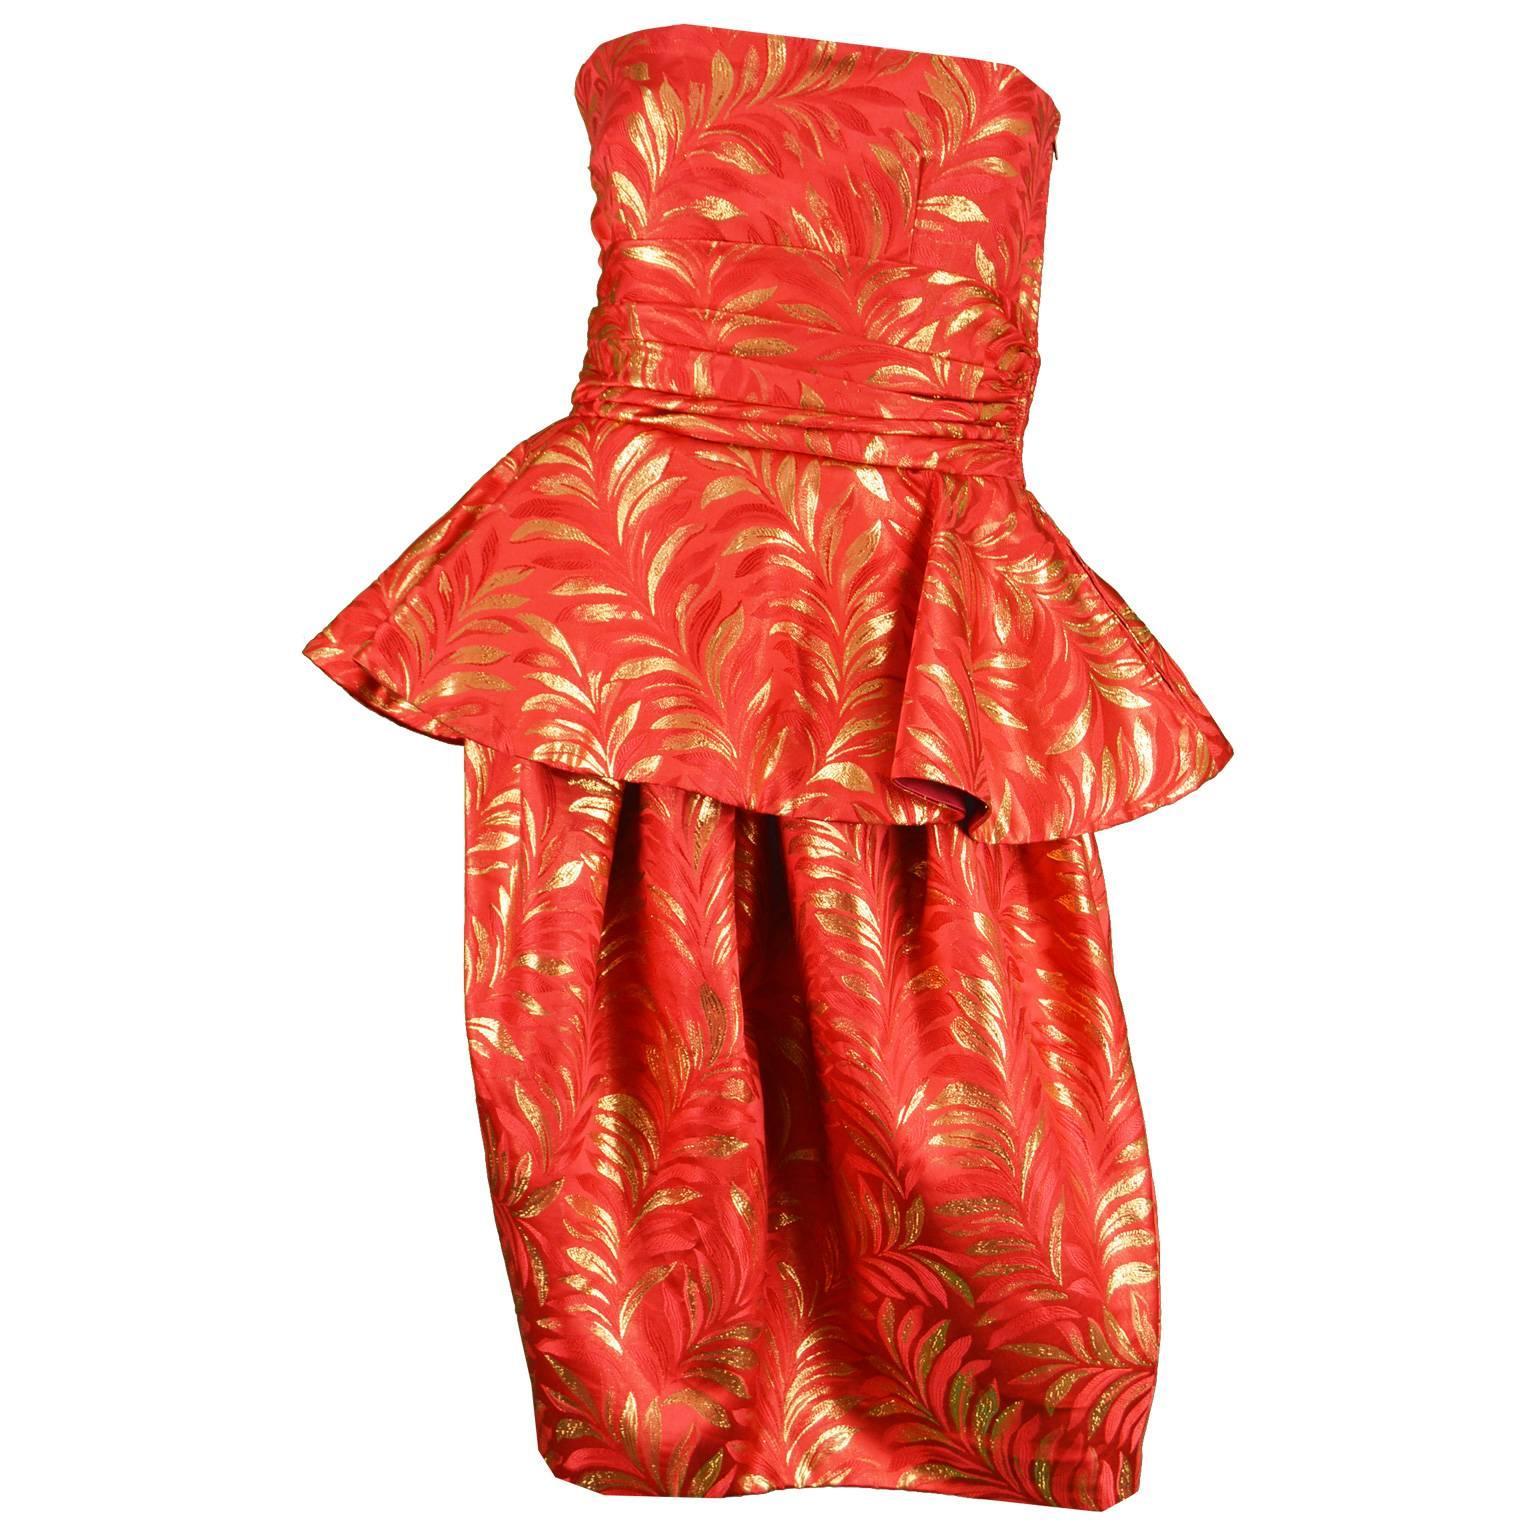 Lanvin Red and Gold Silk Brocade Peplum Vintage Cocktail Evening ...